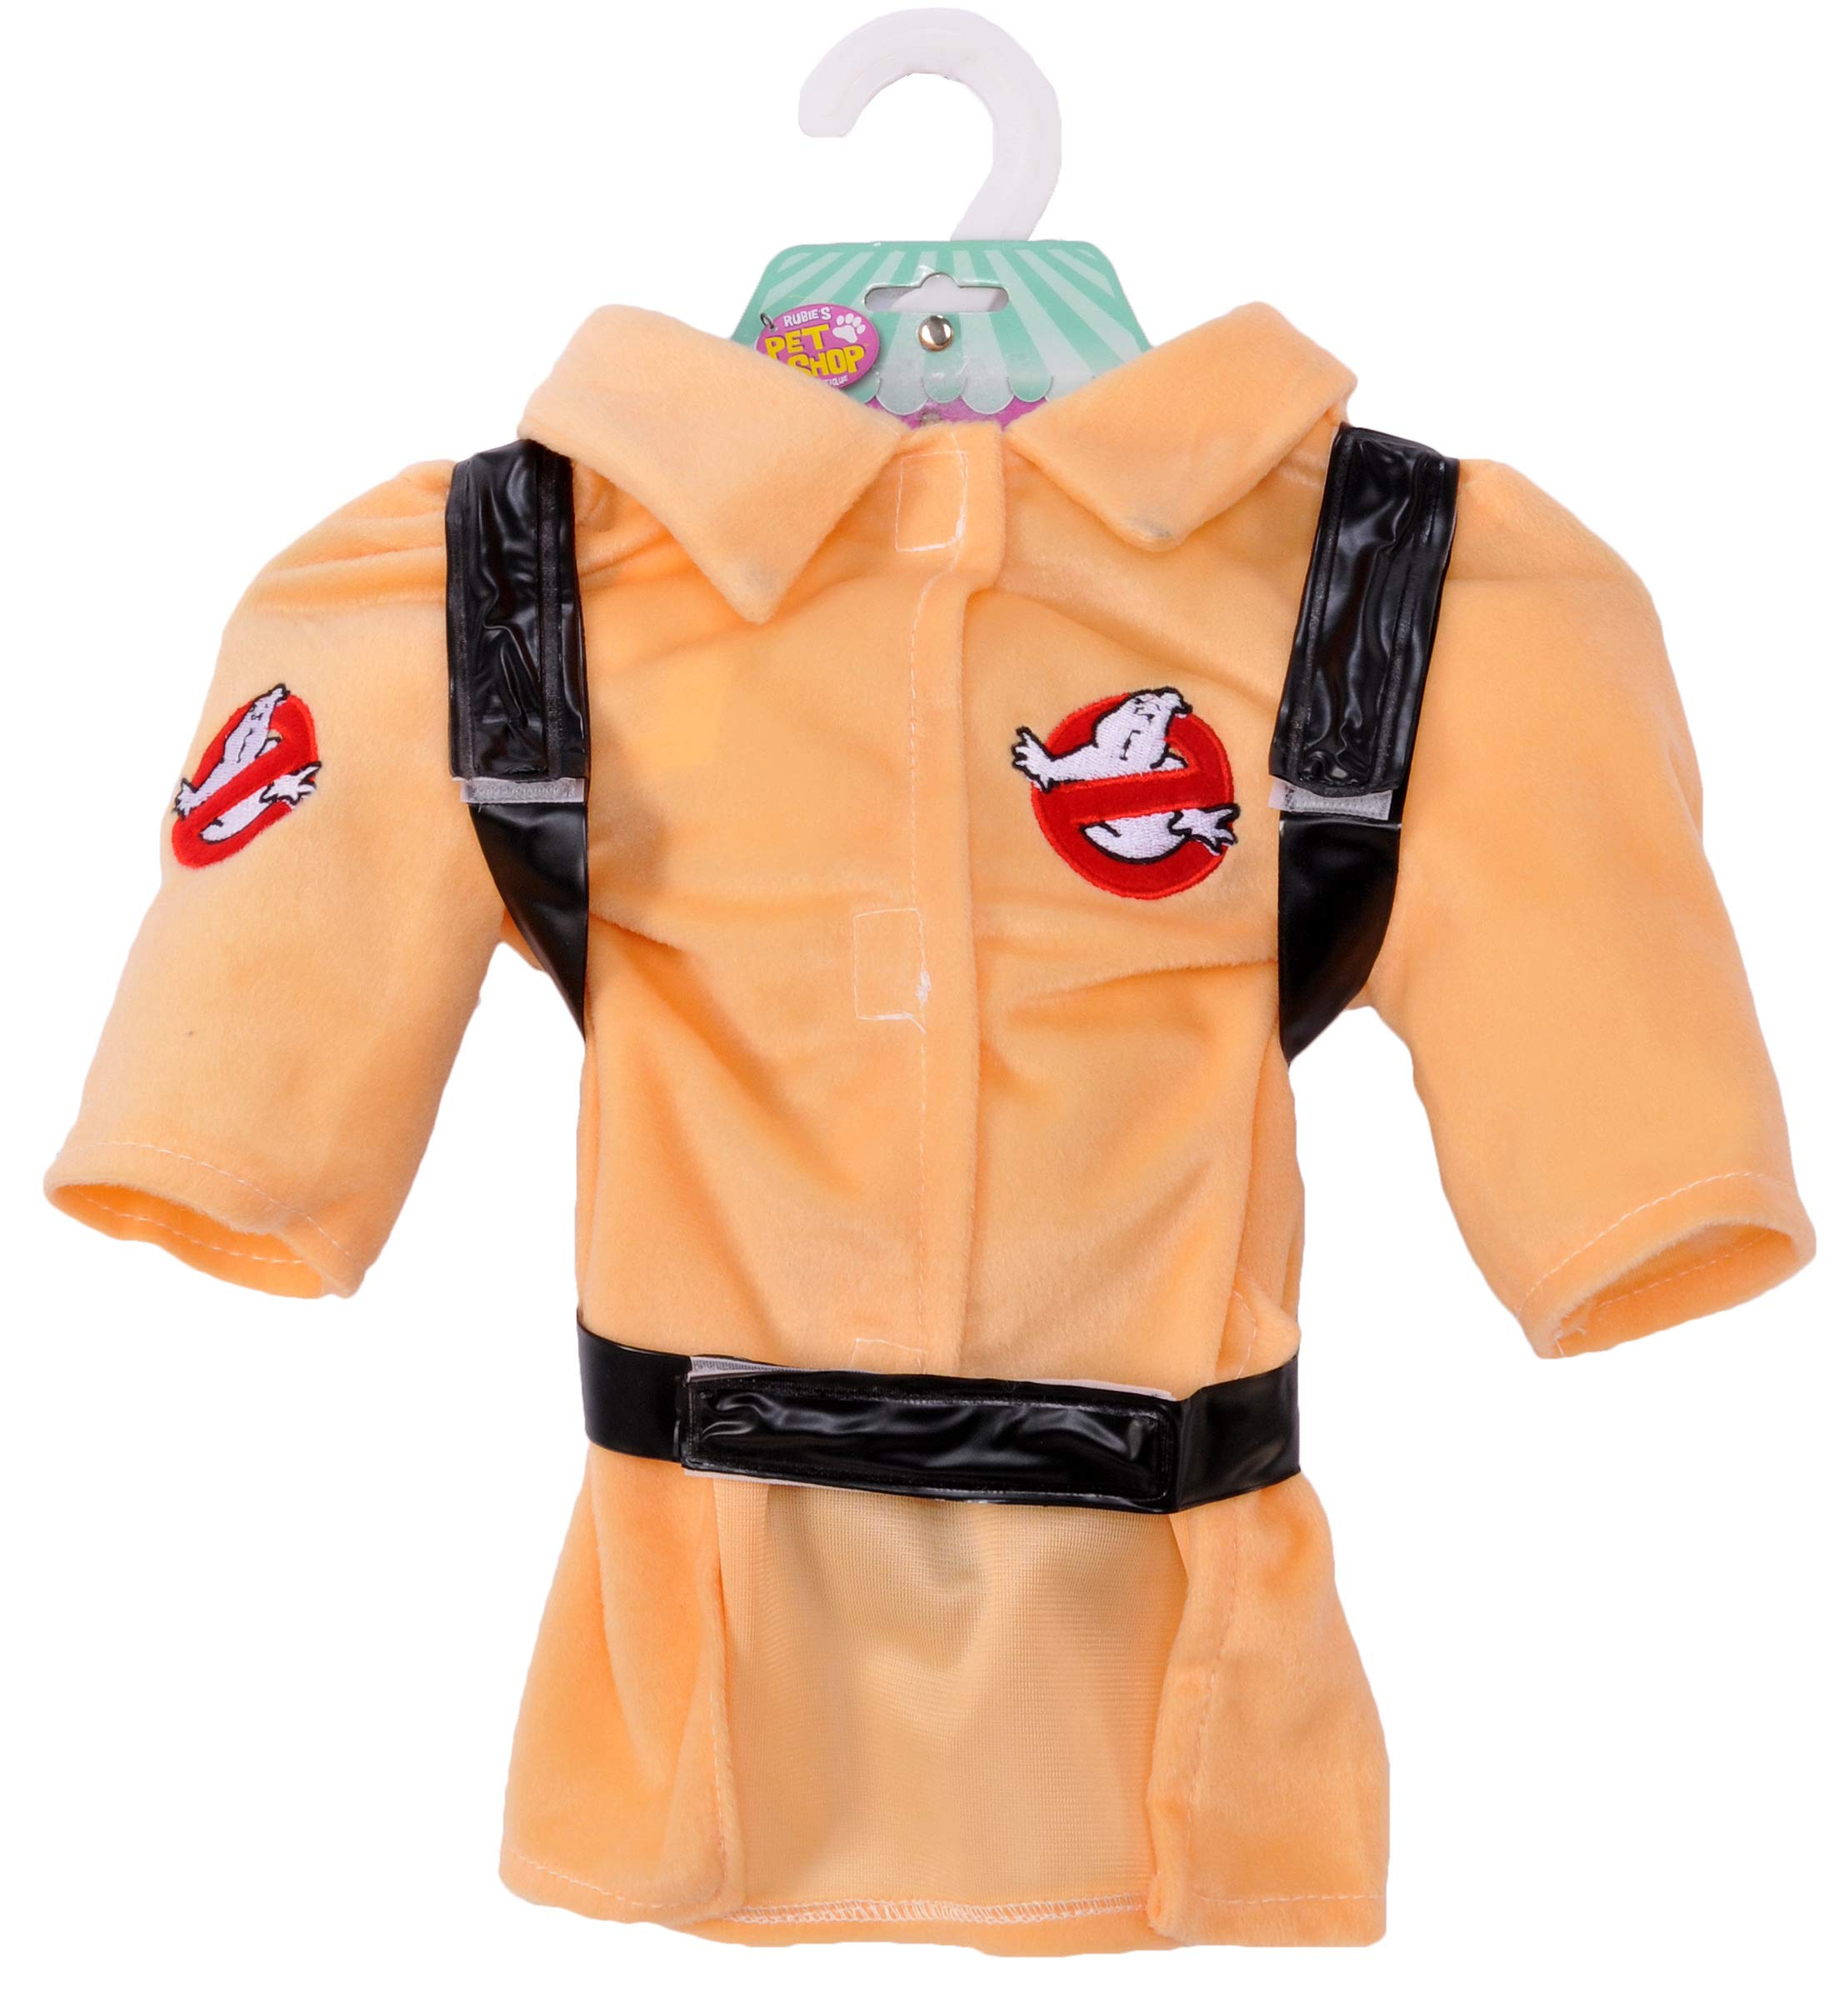 Rubie's Ghostbusters Movie Pet Costume, Large, Ghostbuster Jumpsuit by Rubie's (Image #4)